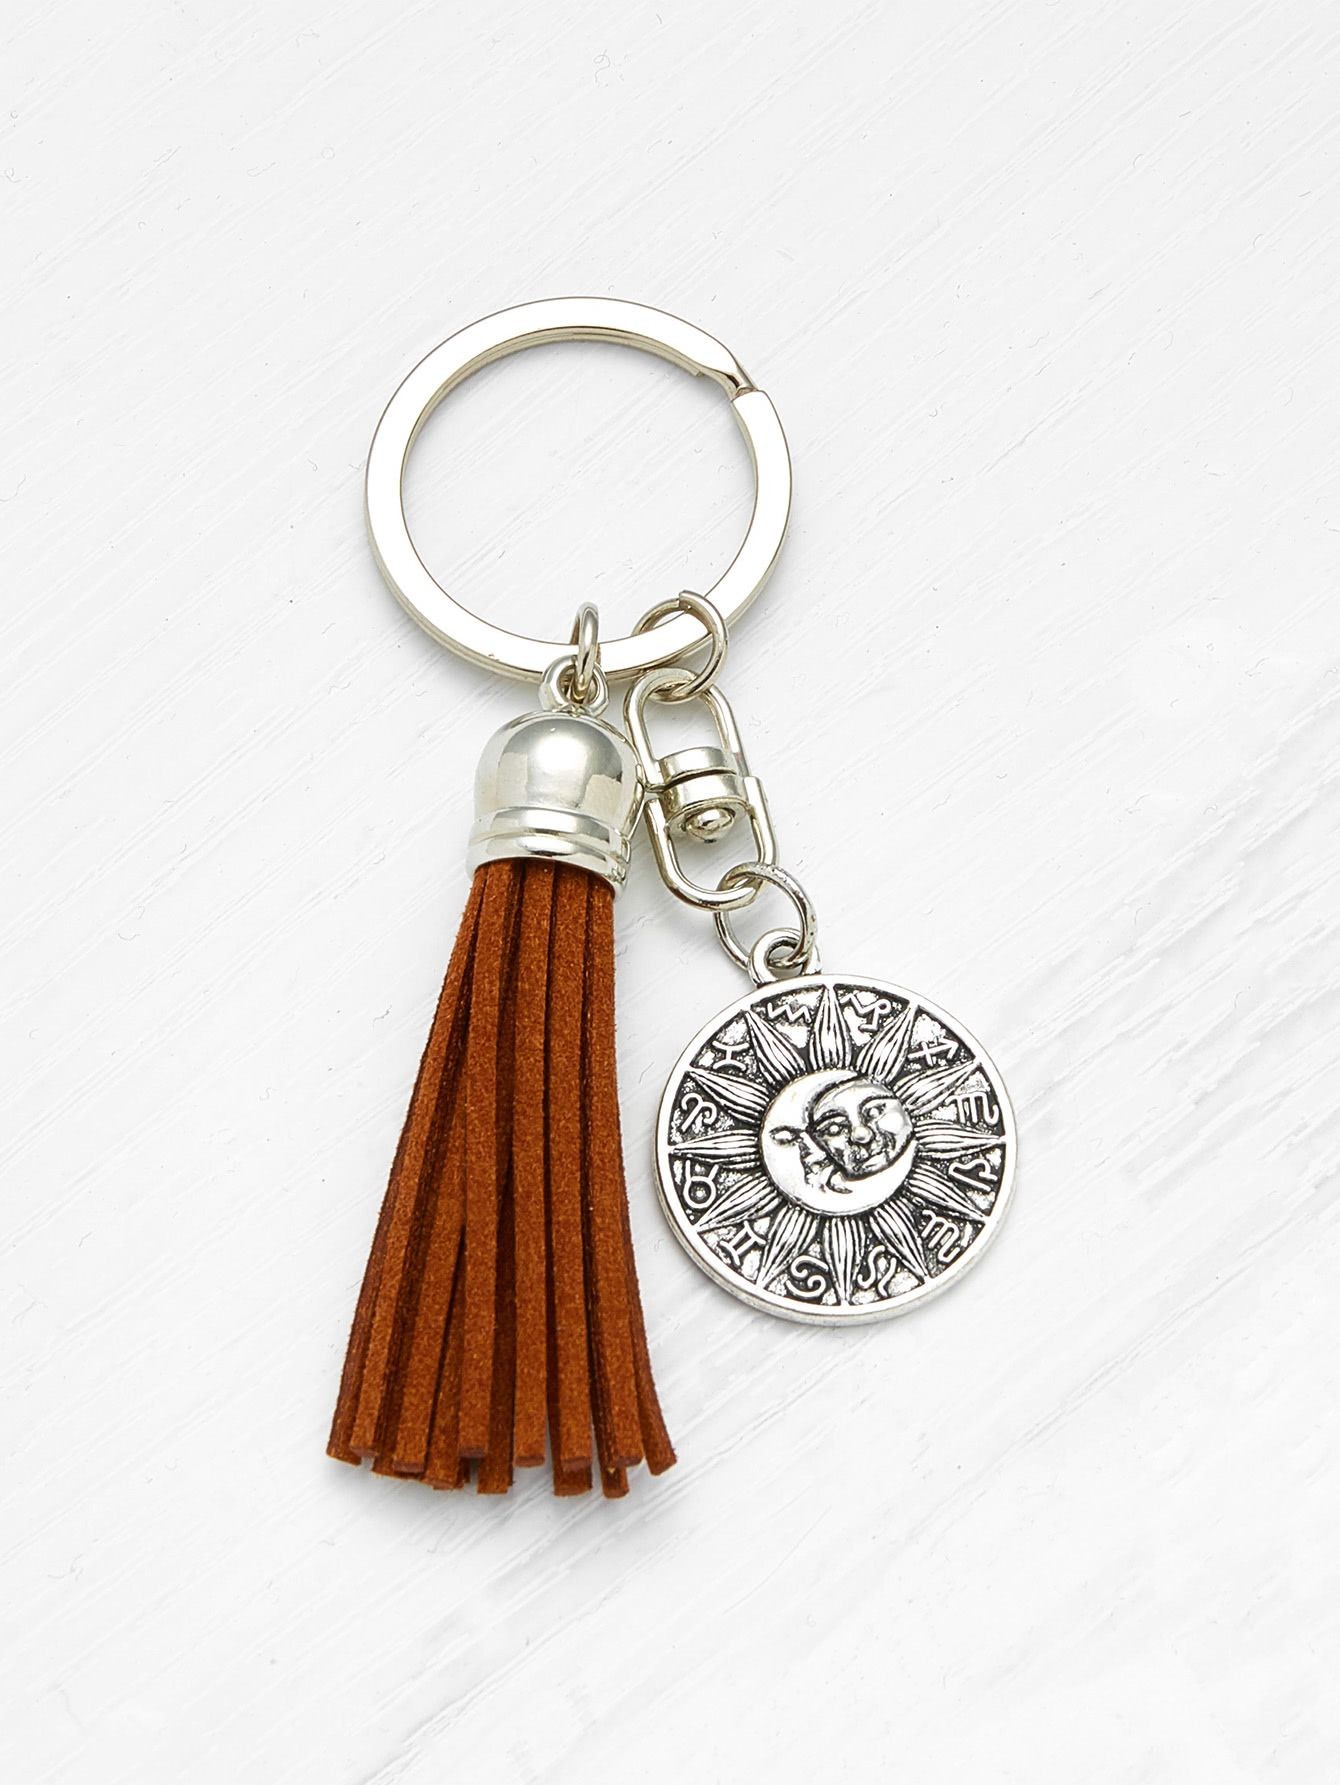 26cedc9045 Shop Tassel Decorated Keychain online. SheIn offers Tassel Decorated  Keychain & more to fit your fashionable needs.